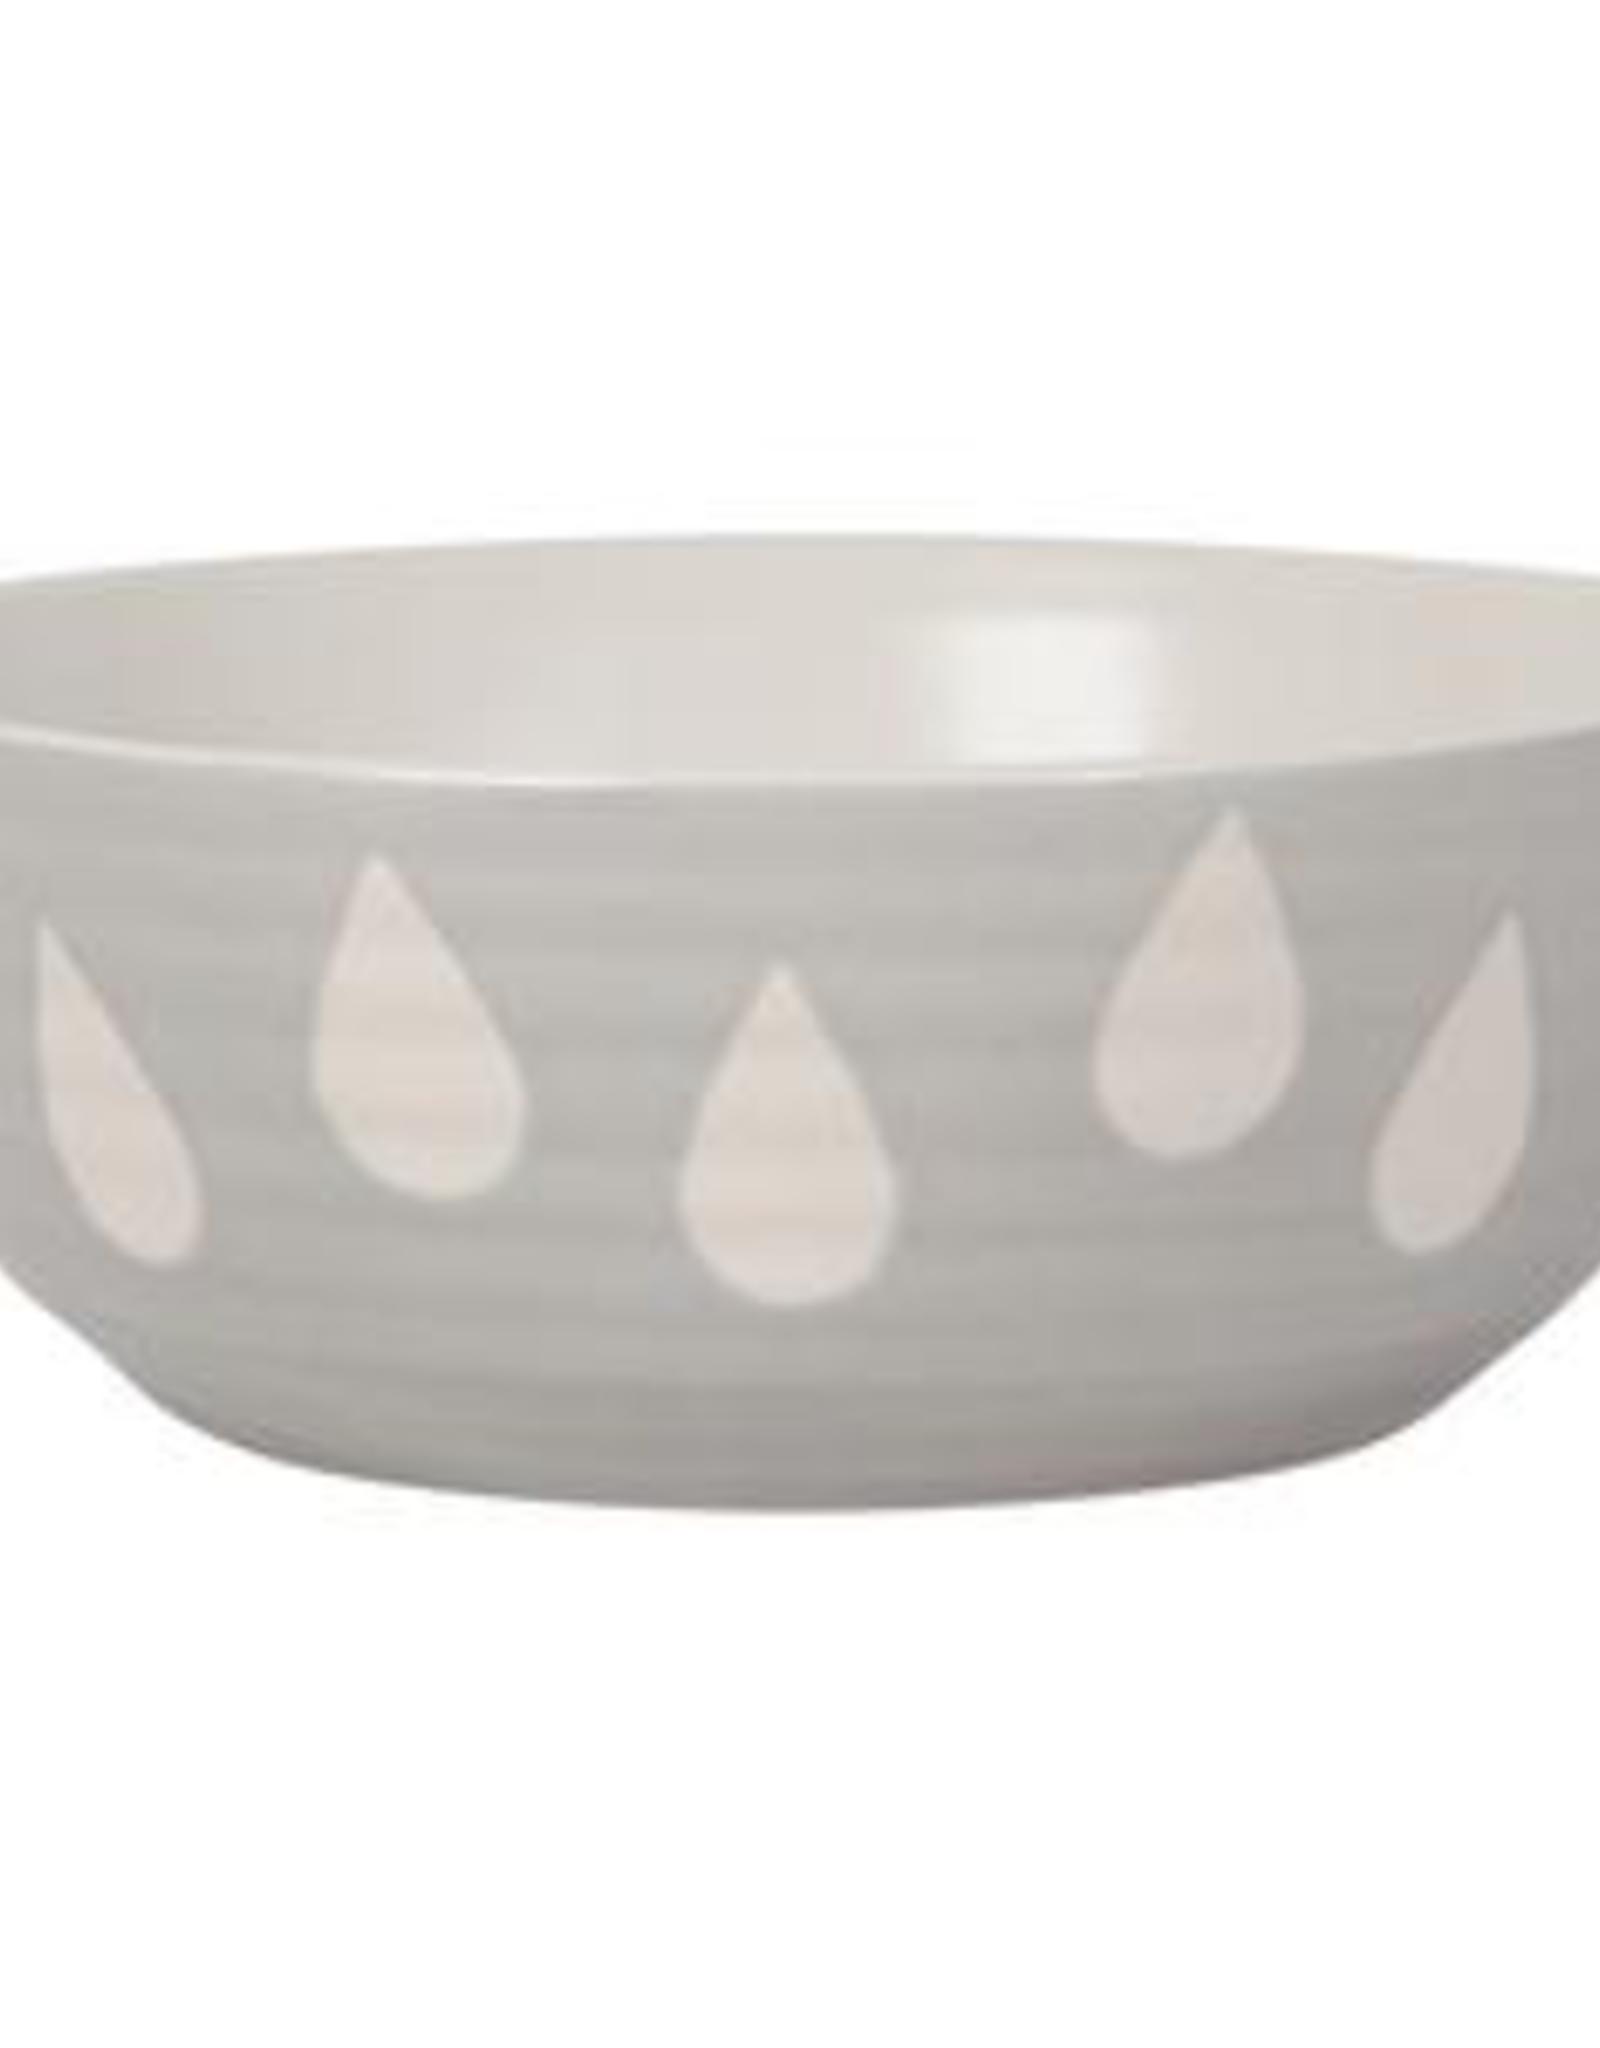 Danica Danica Imprint Bowl-Gray